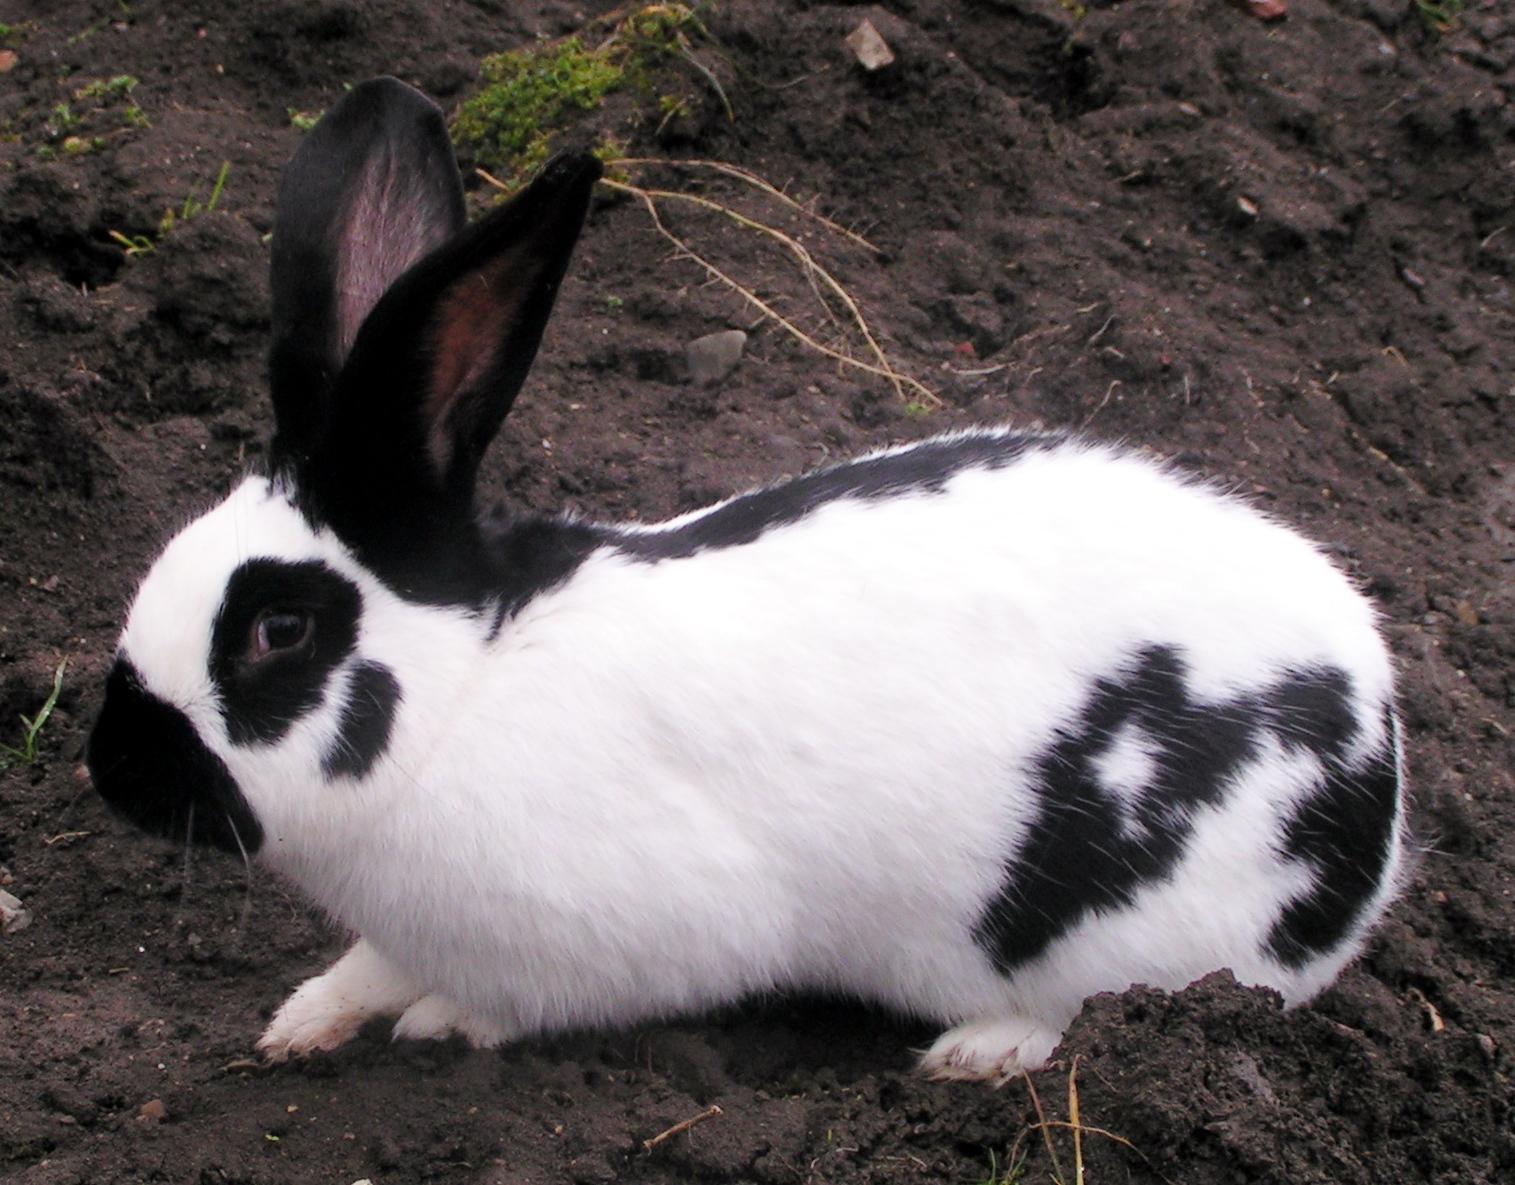 Checkered Giant rabbit - Wikipedia